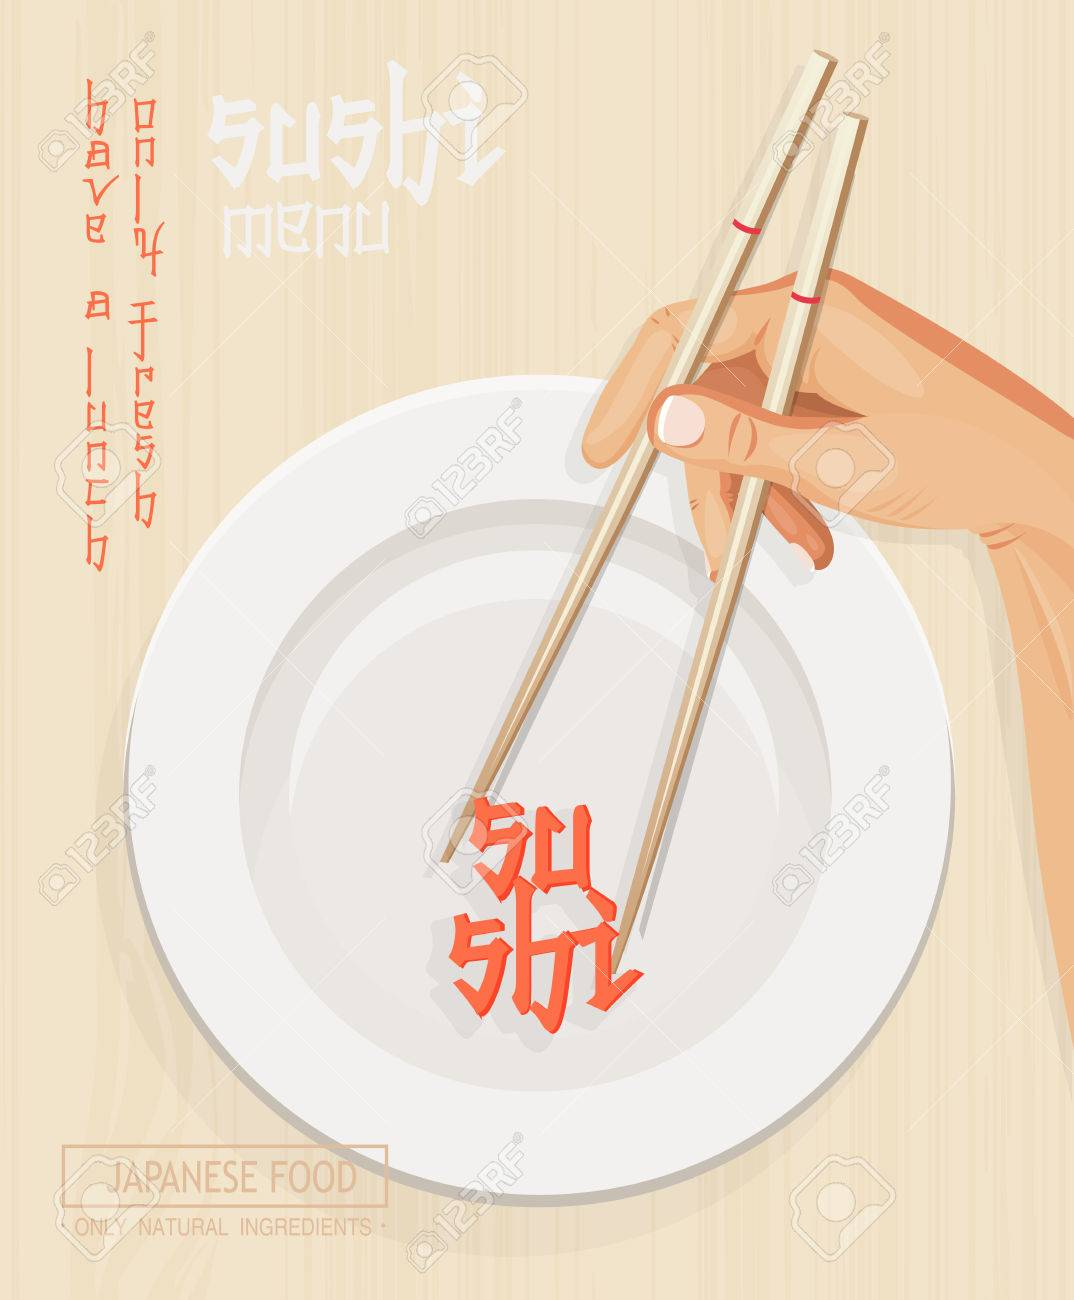 japanese cuisine restaurant sushi menu cover in light design royalty